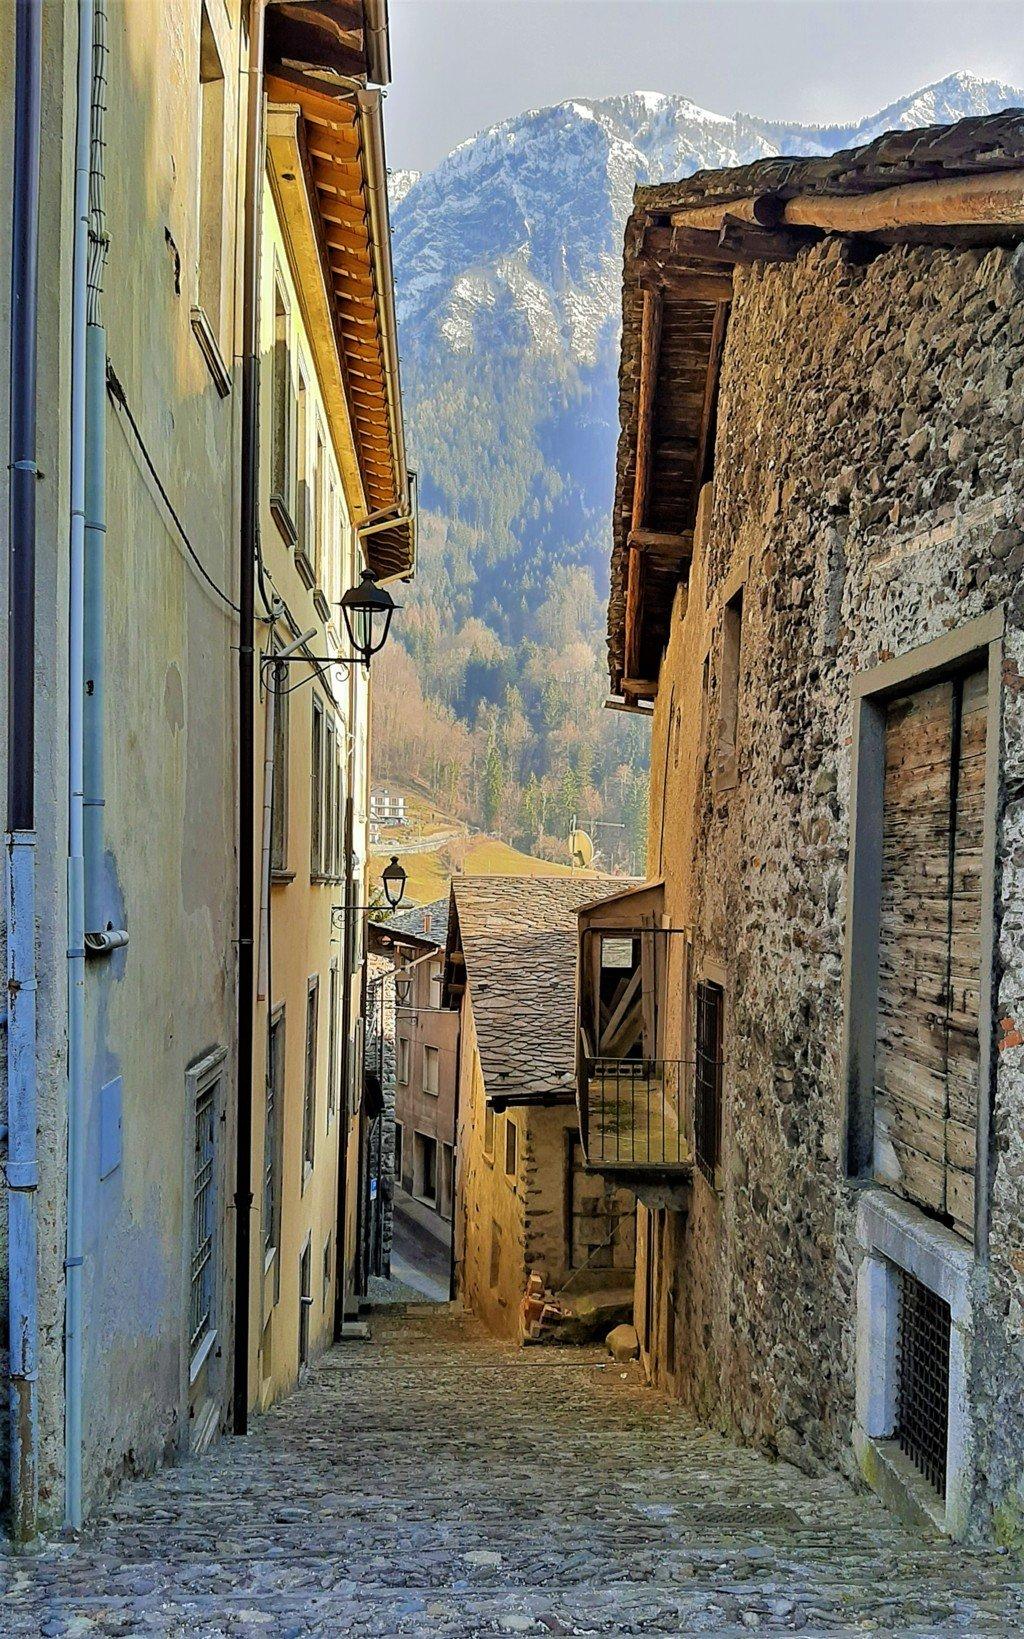 I vicoli di Gromo in Val Seriana